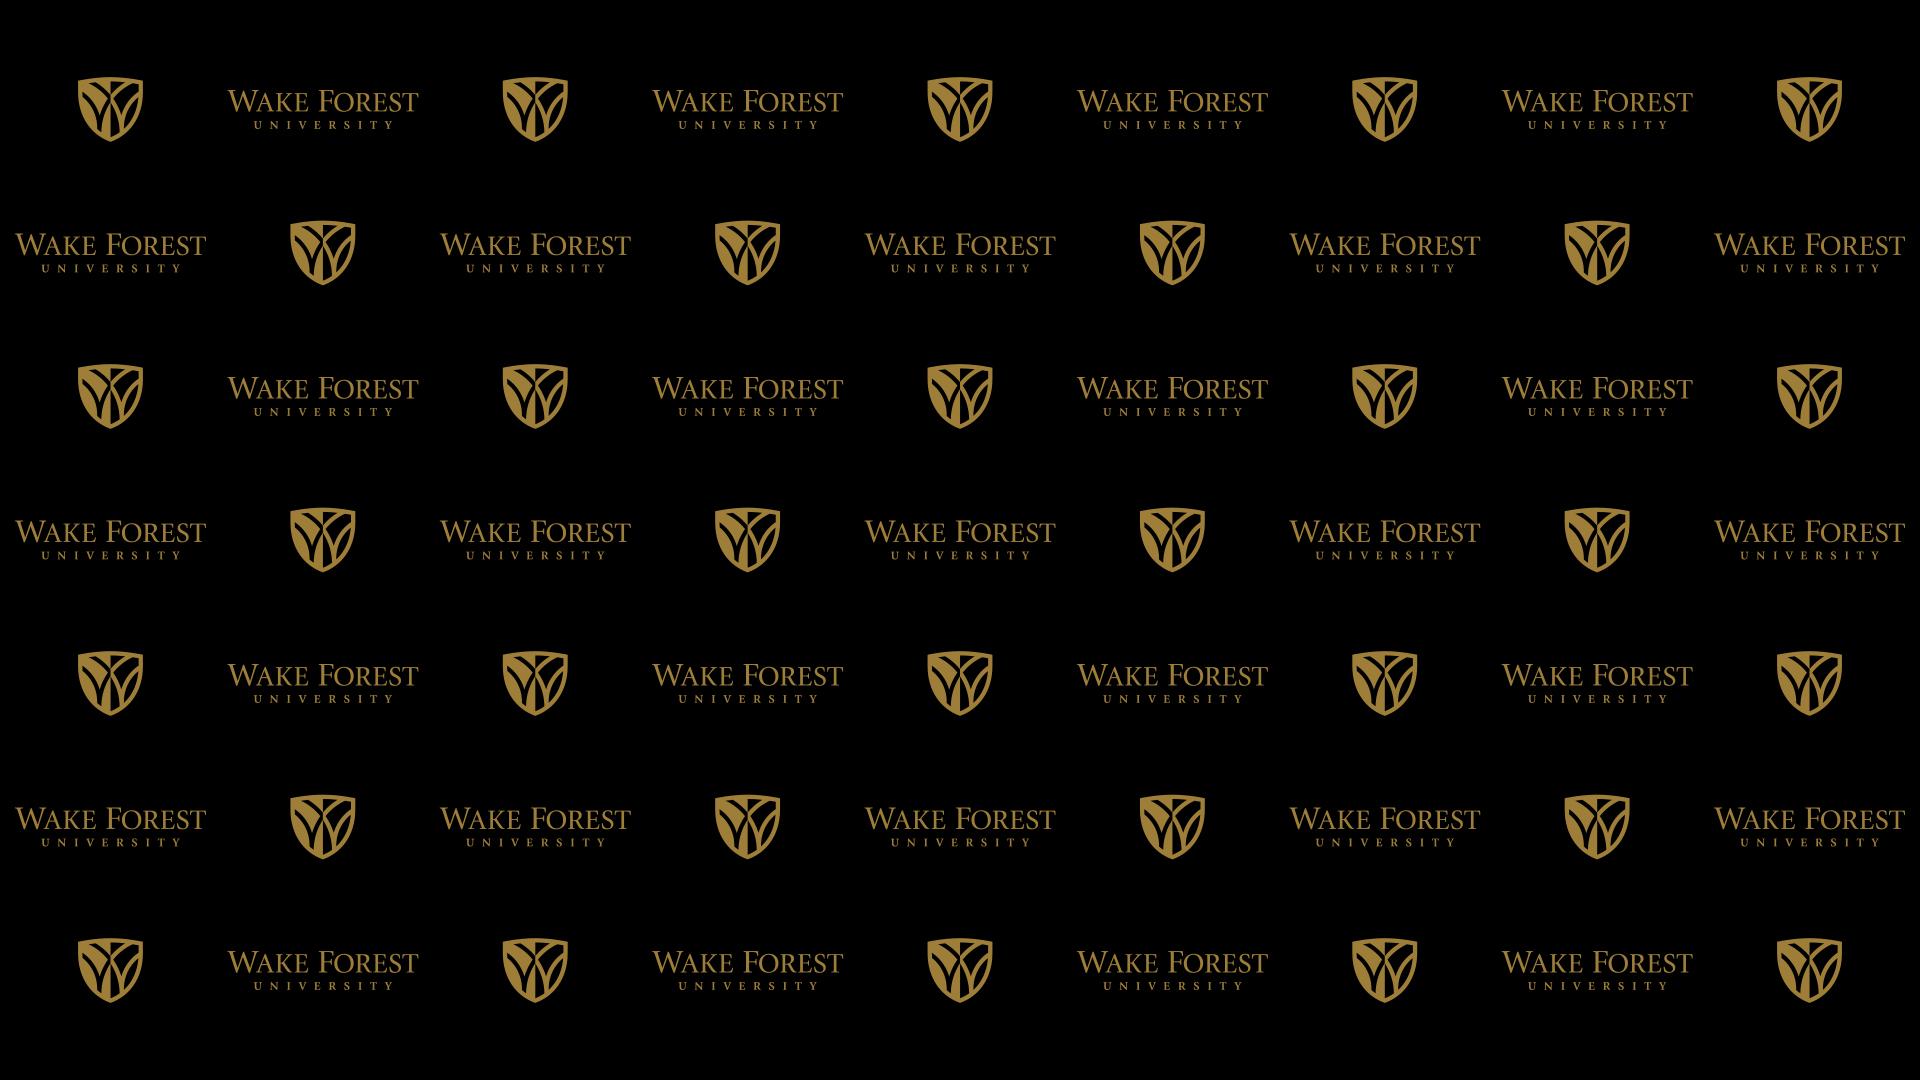 logo wall wallpaper